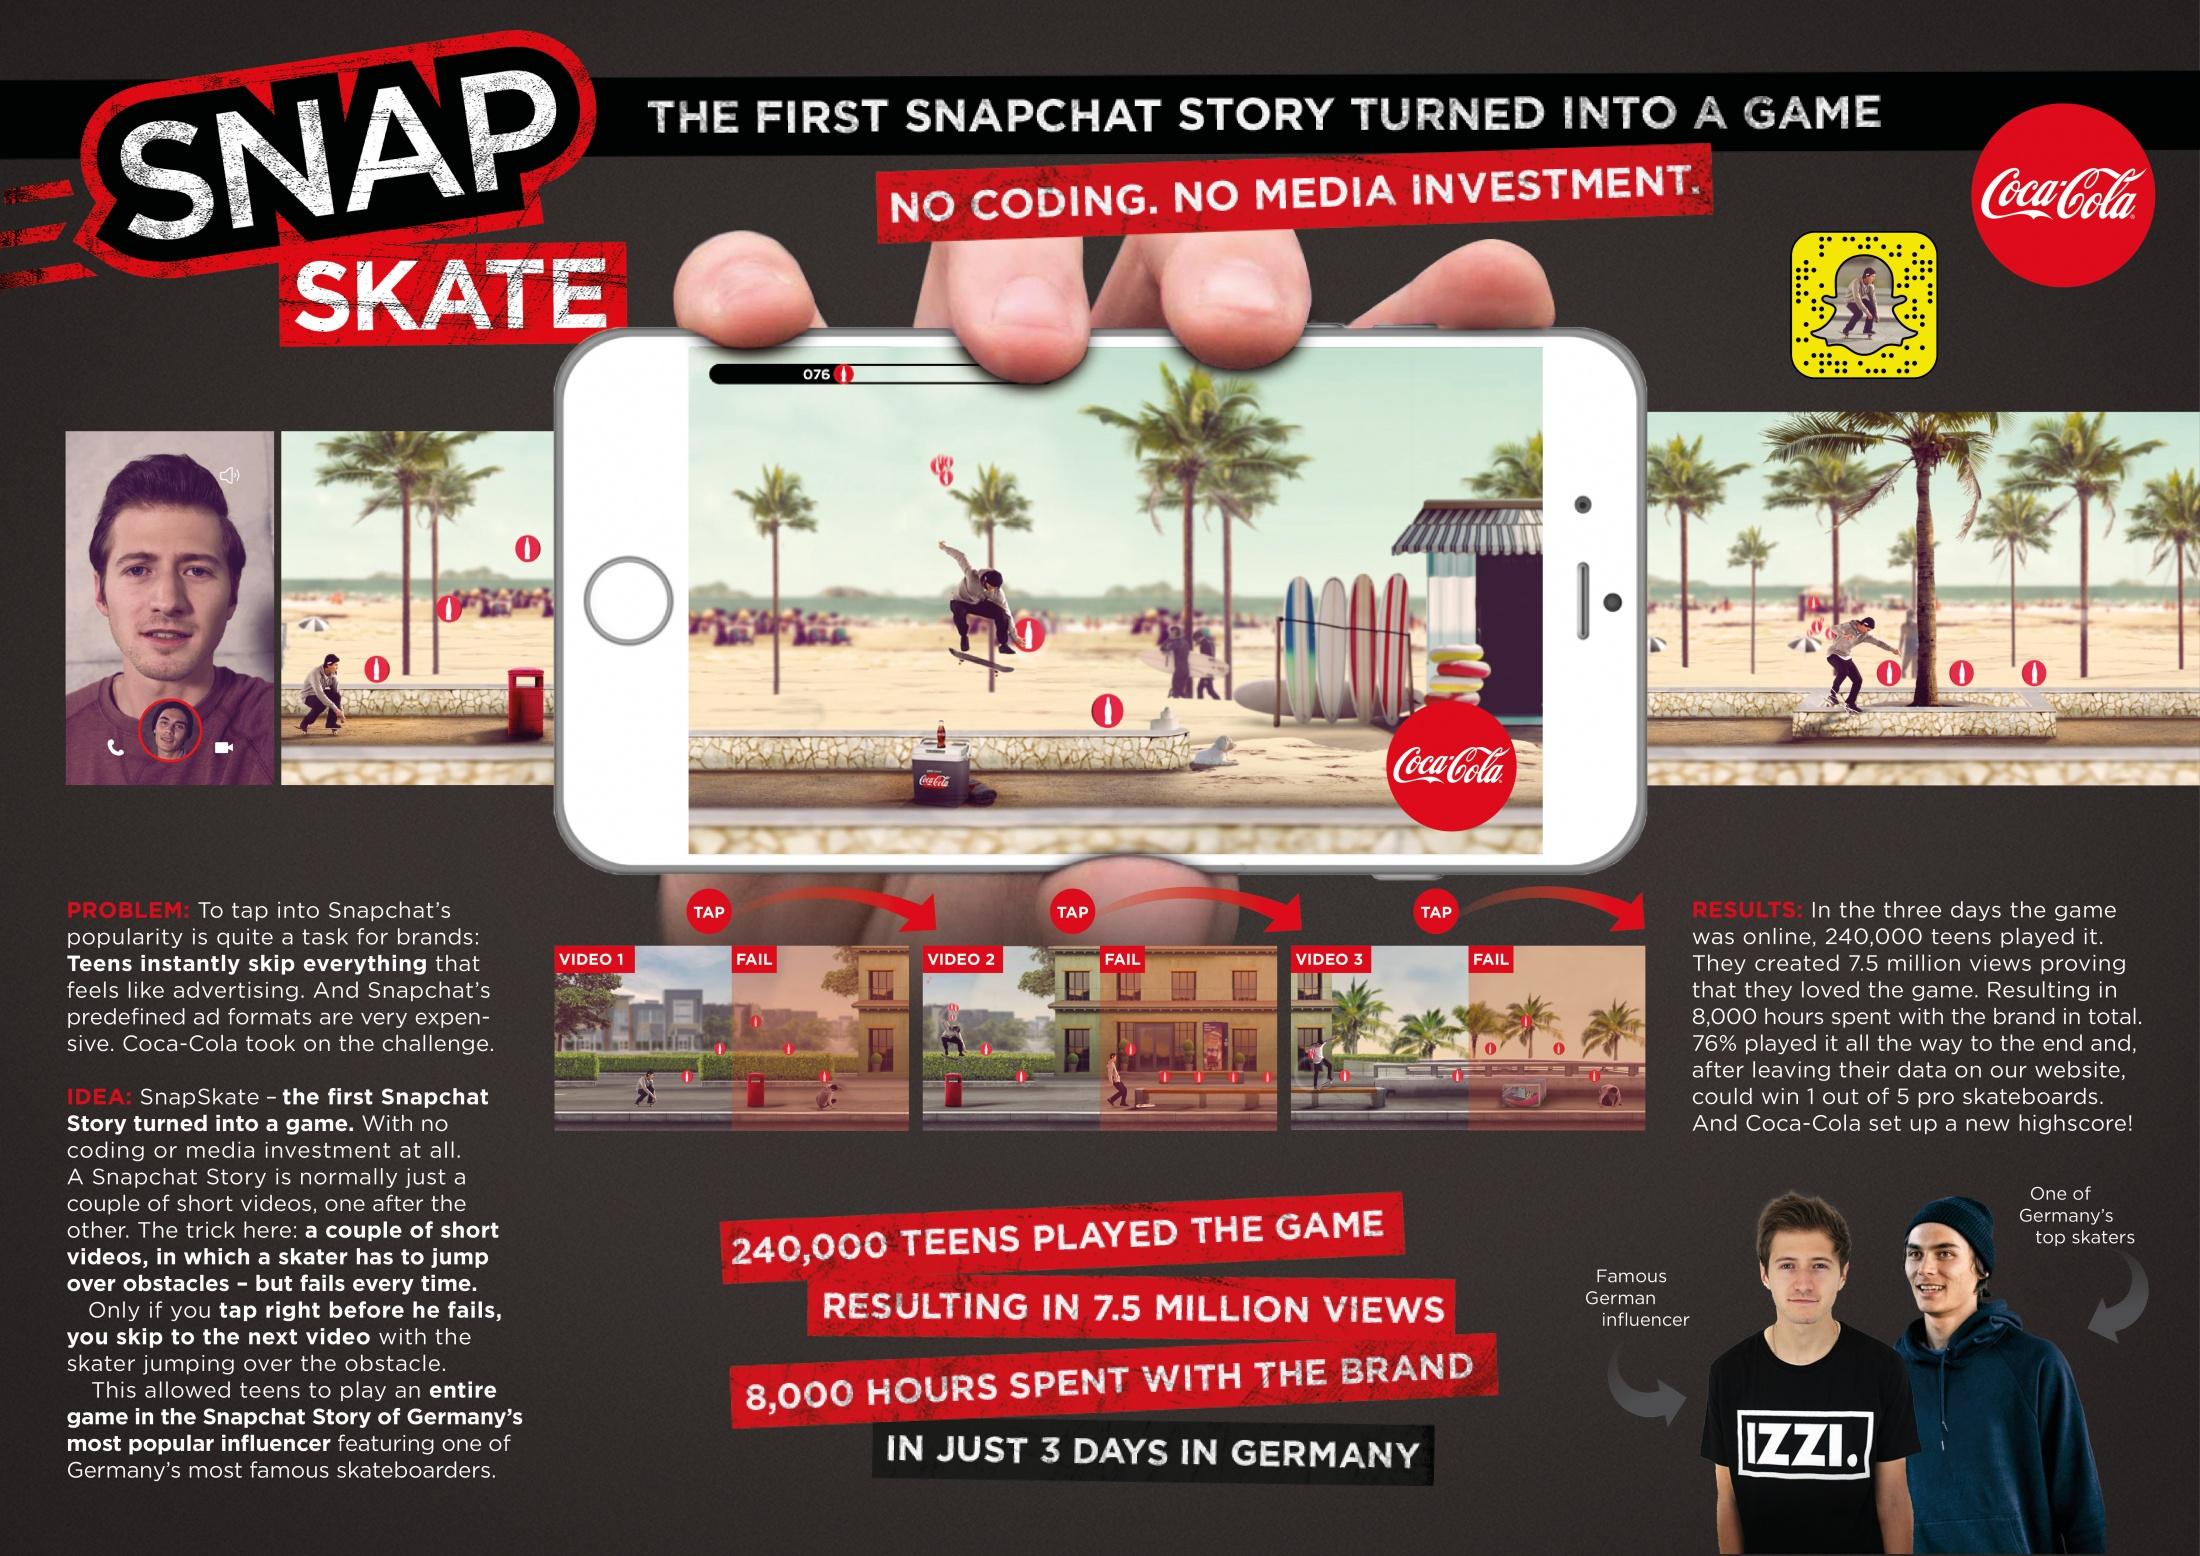 Thumbnail for SnapSkate